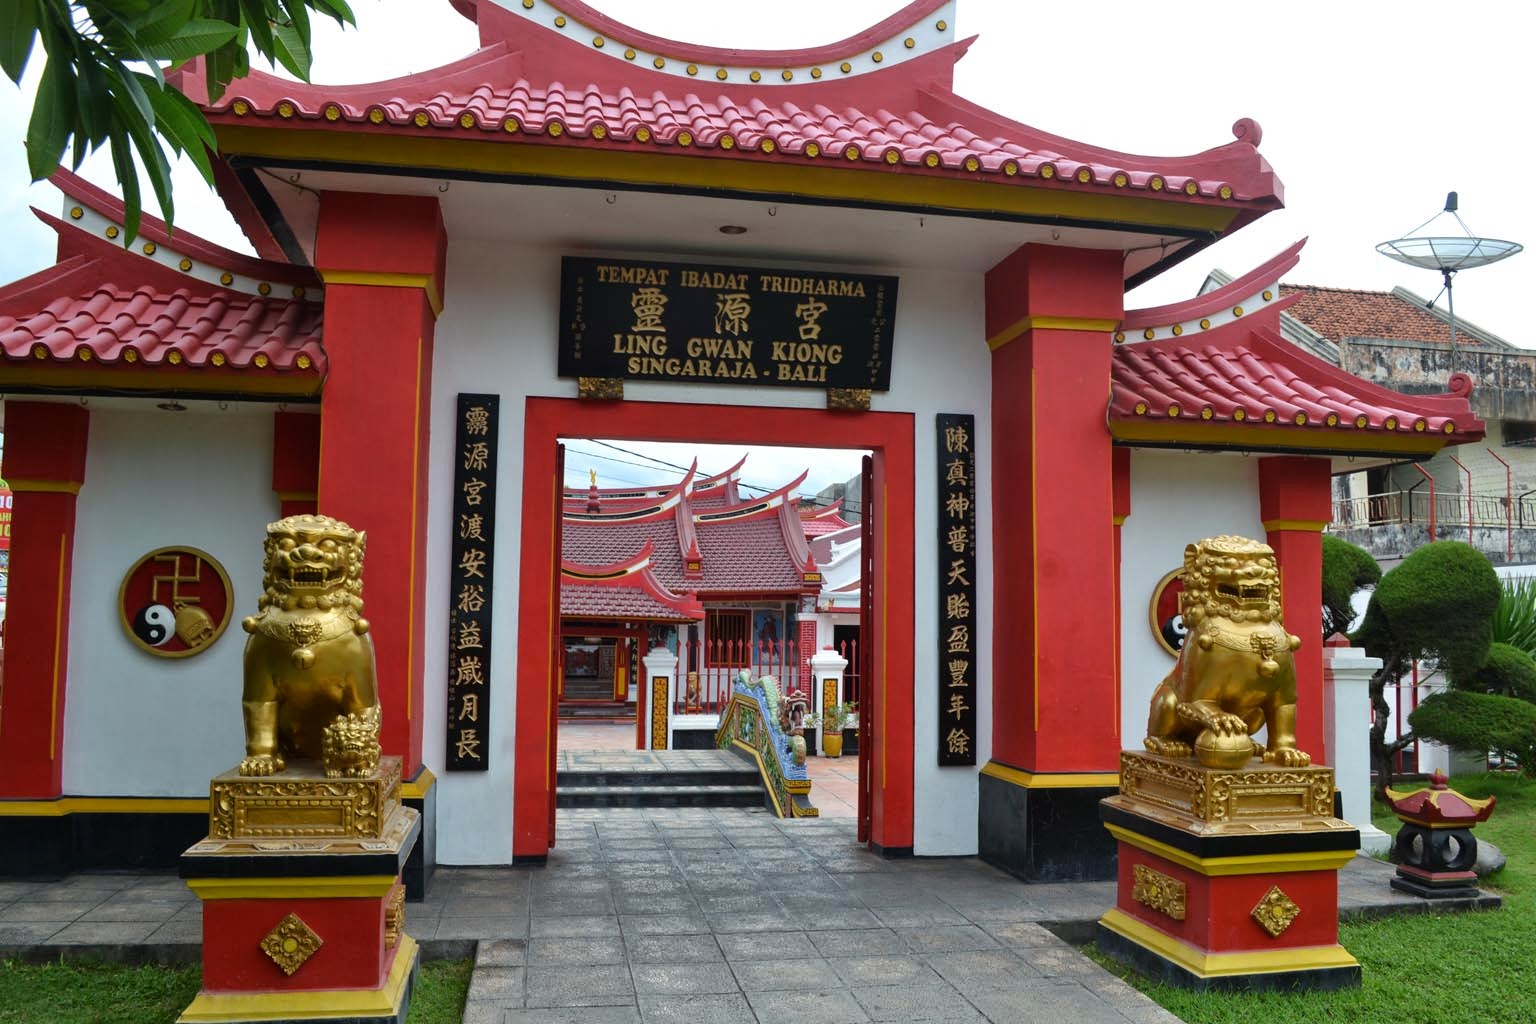 Ling Gwan Kiong Chinese Temple